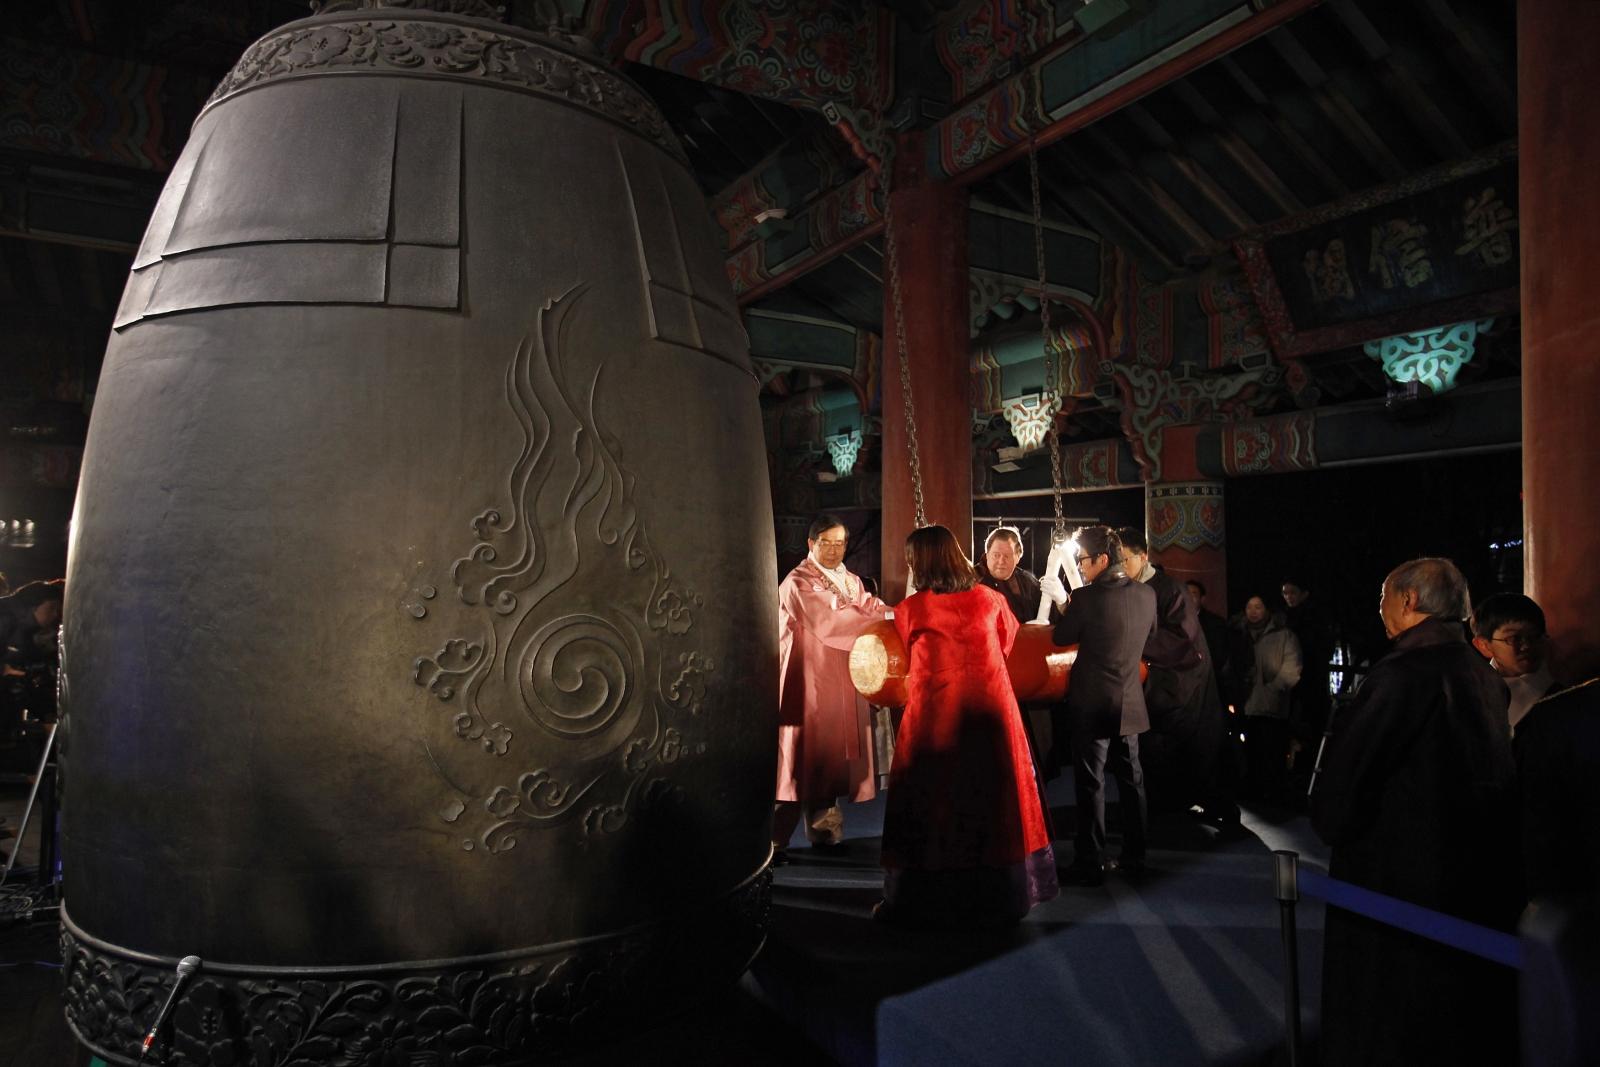 Seoul bell ringing